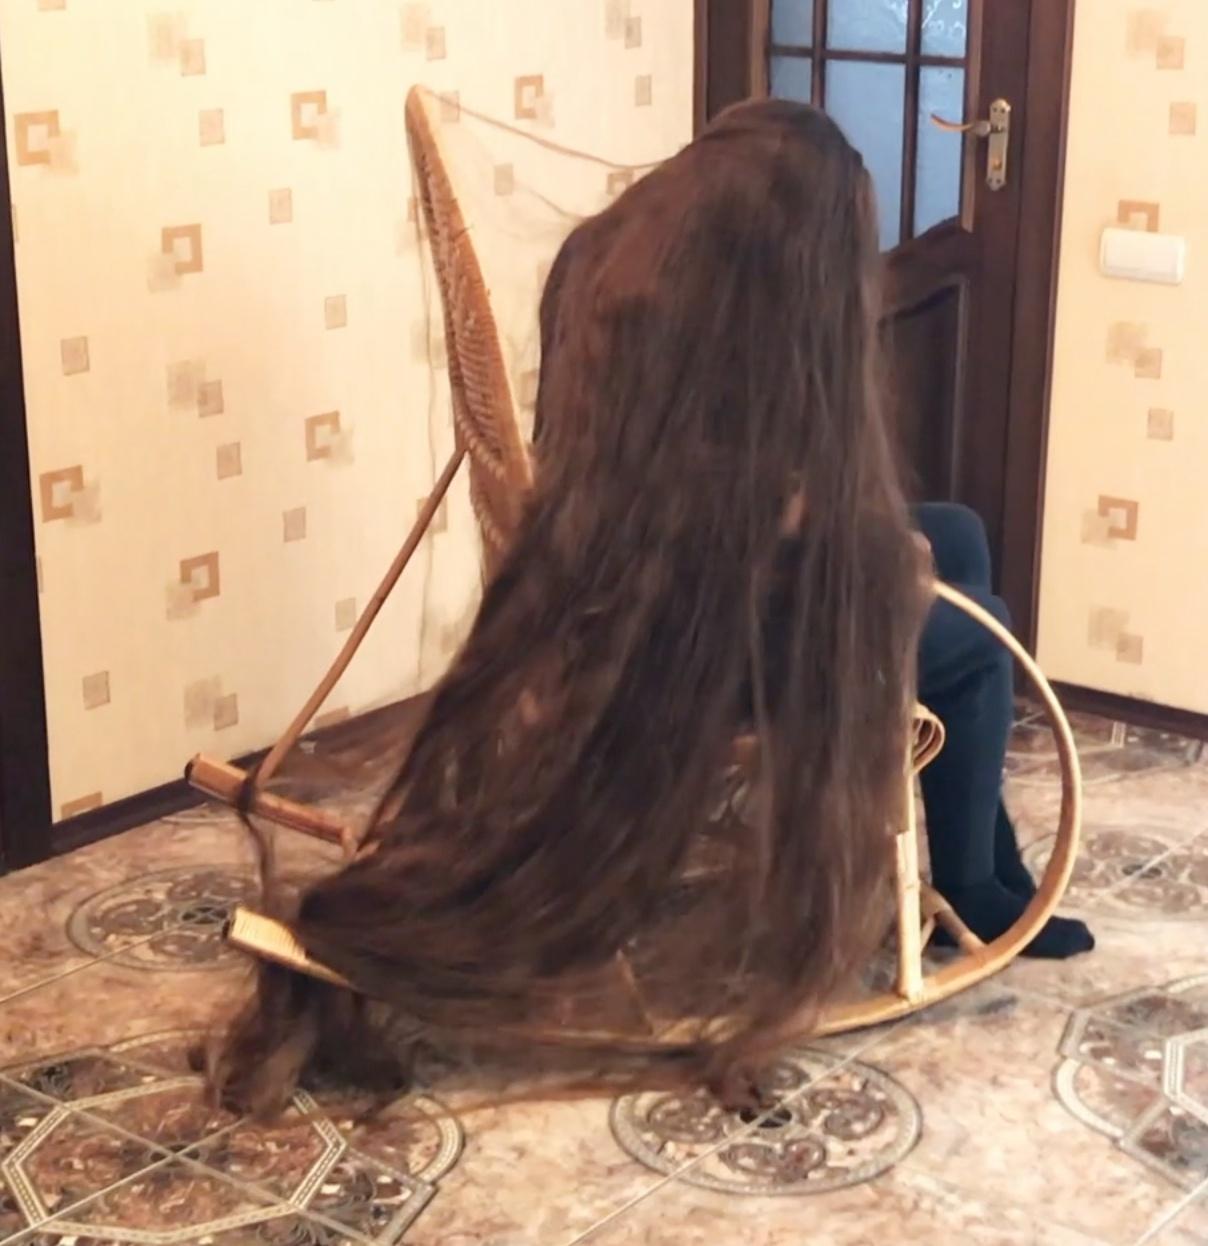 VIDEO - Rocking chair